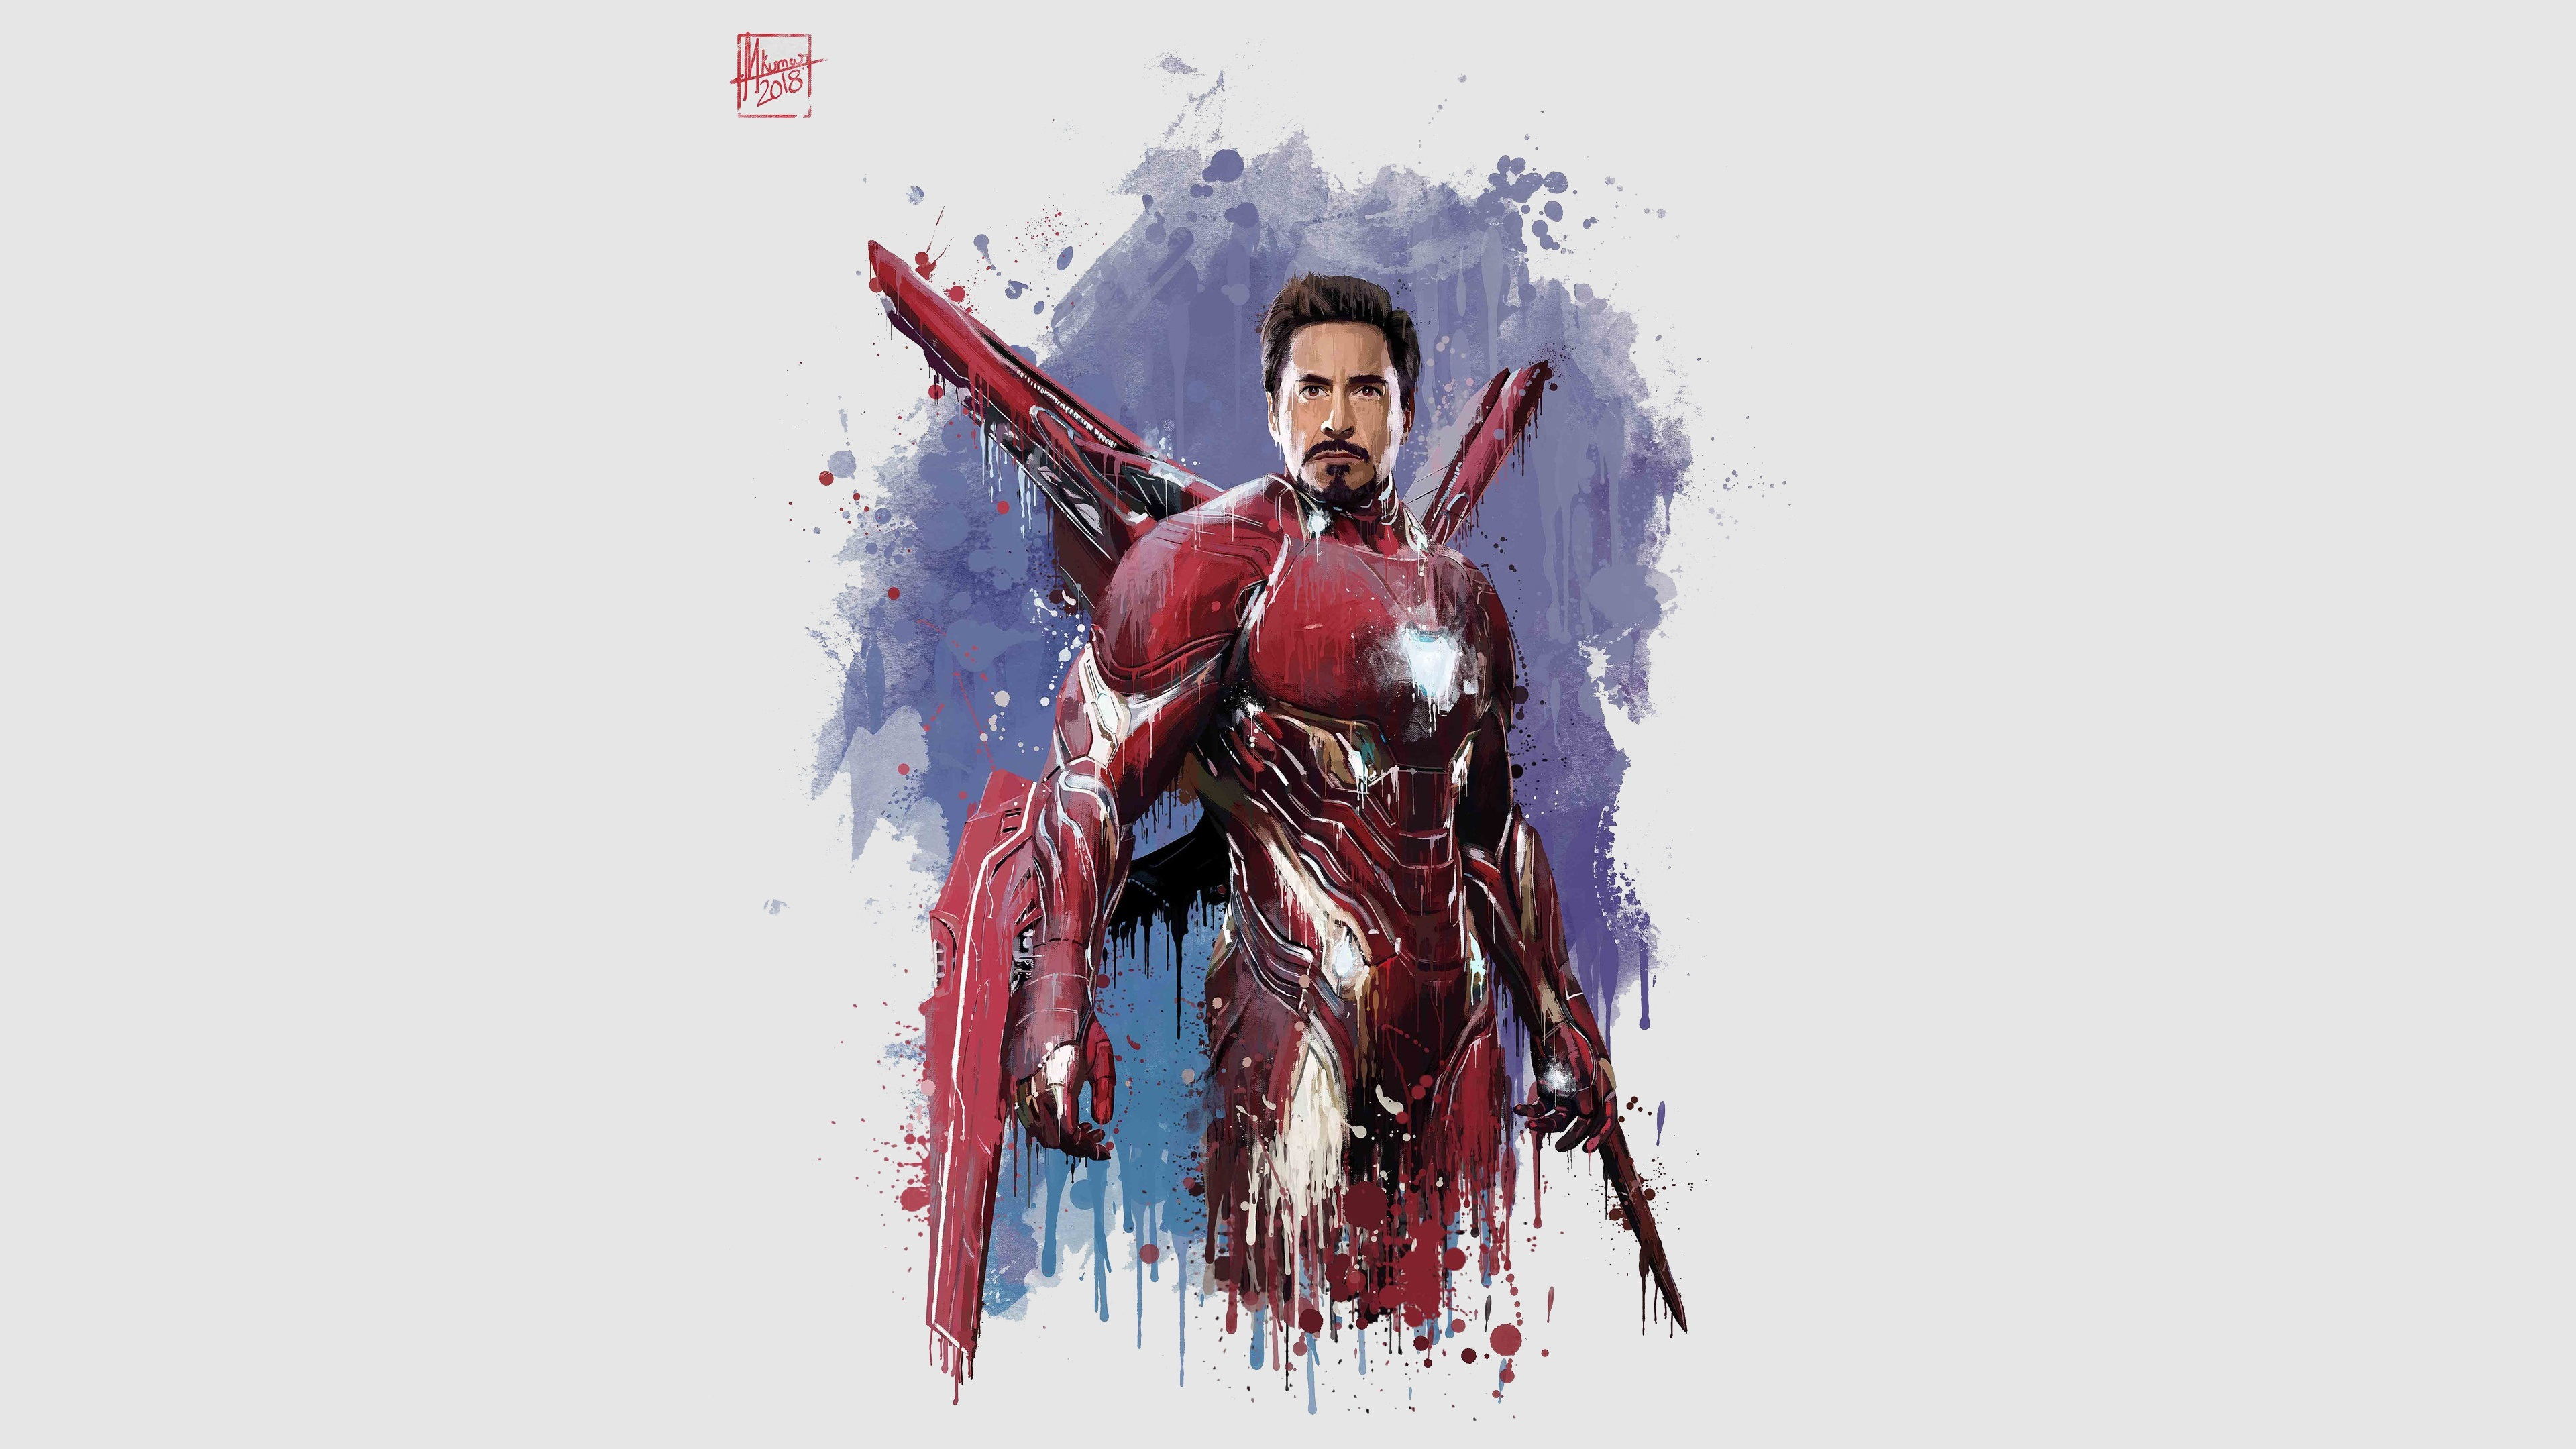 Wallpaper Iron Man The Avengers Infinity War Art Picture